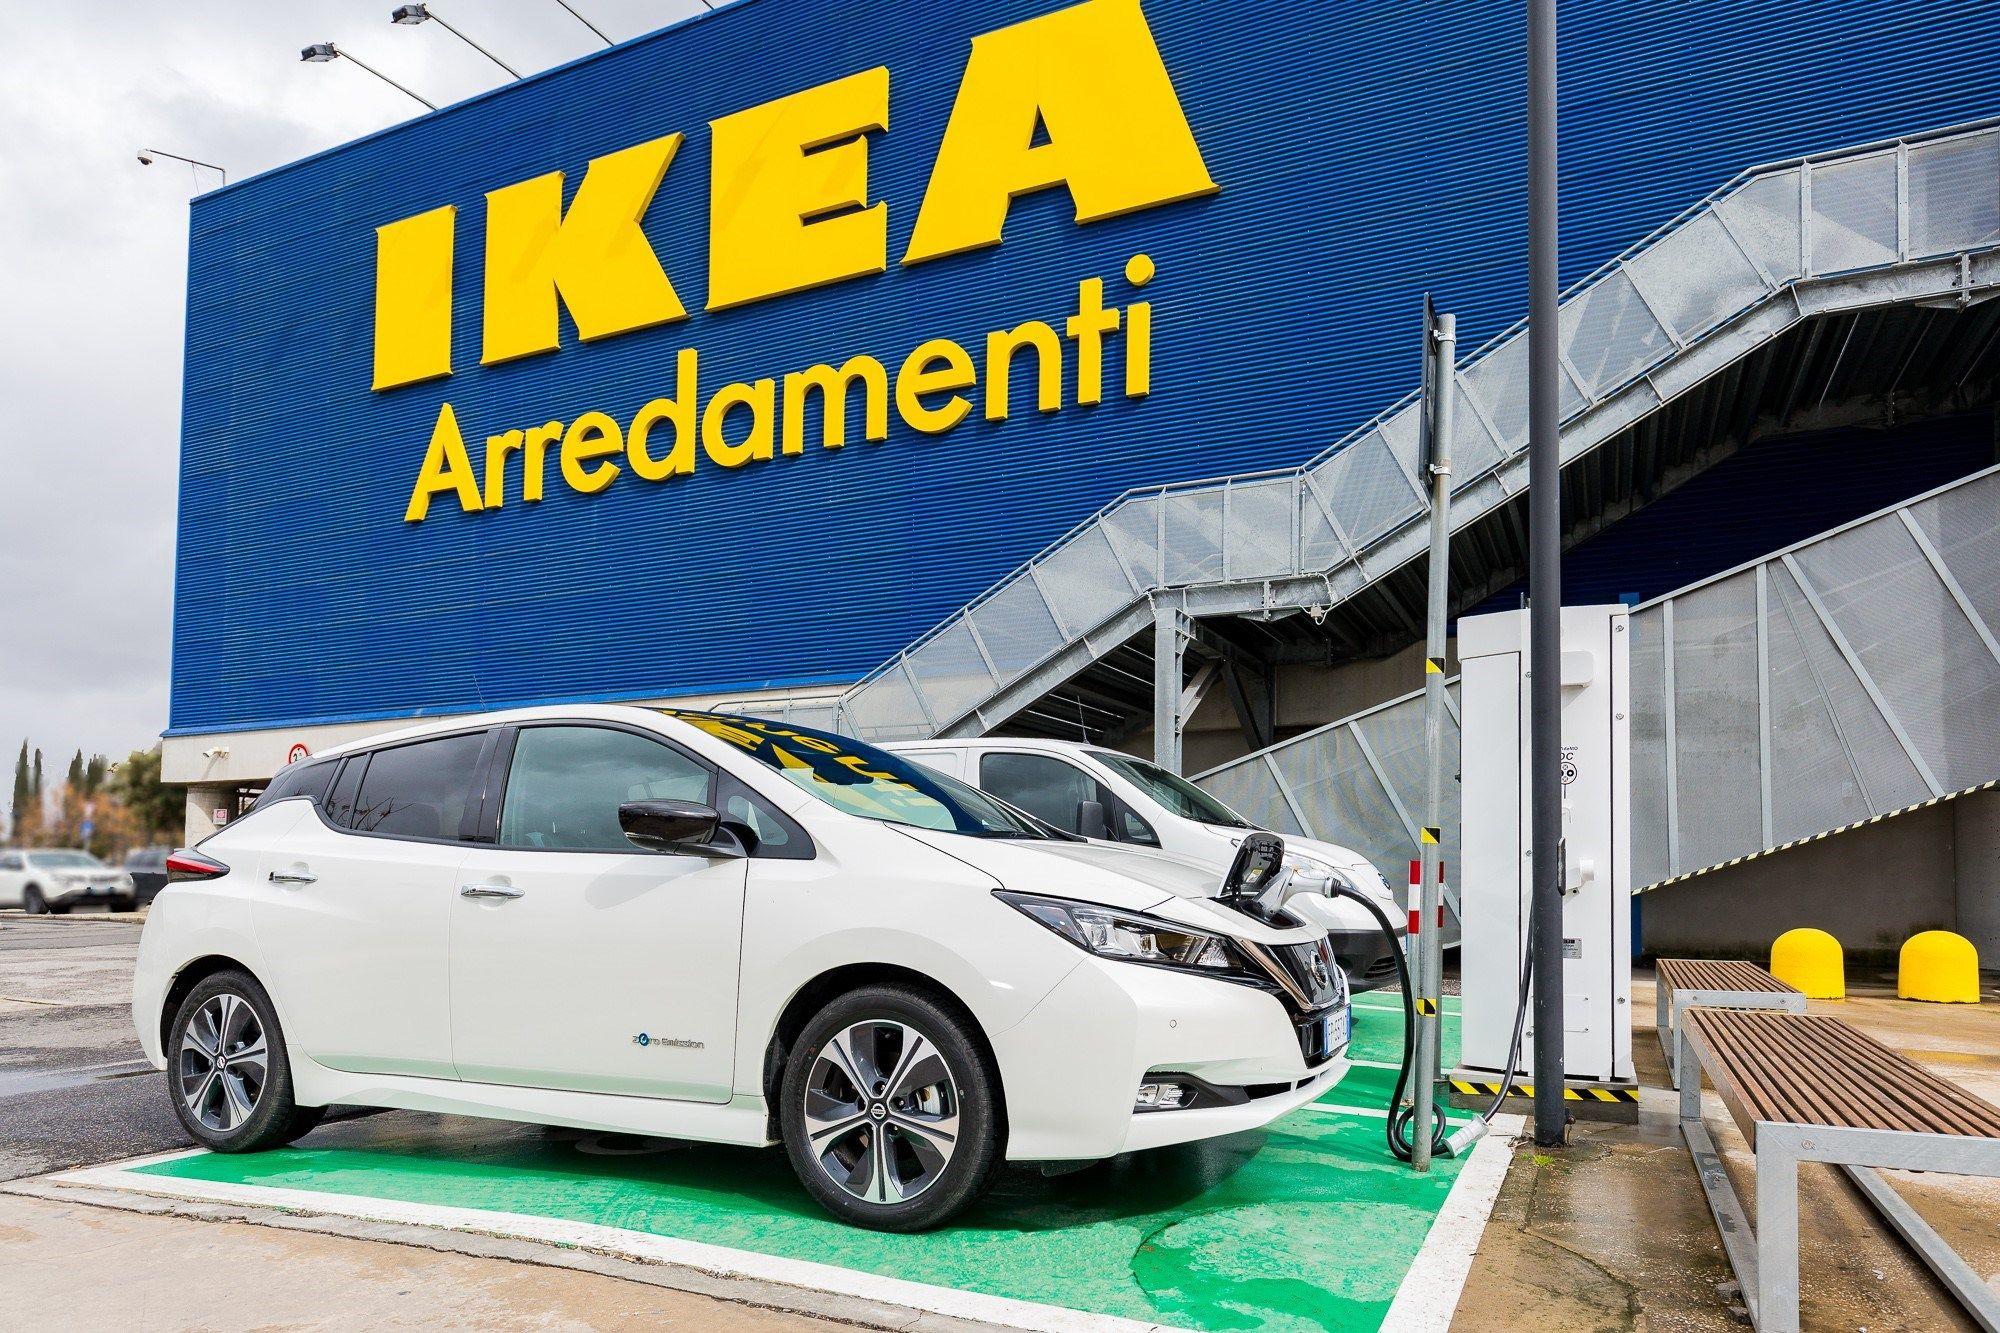 A Ikea Anagnina Di Roma La Ricarica Elettrica è Gratis